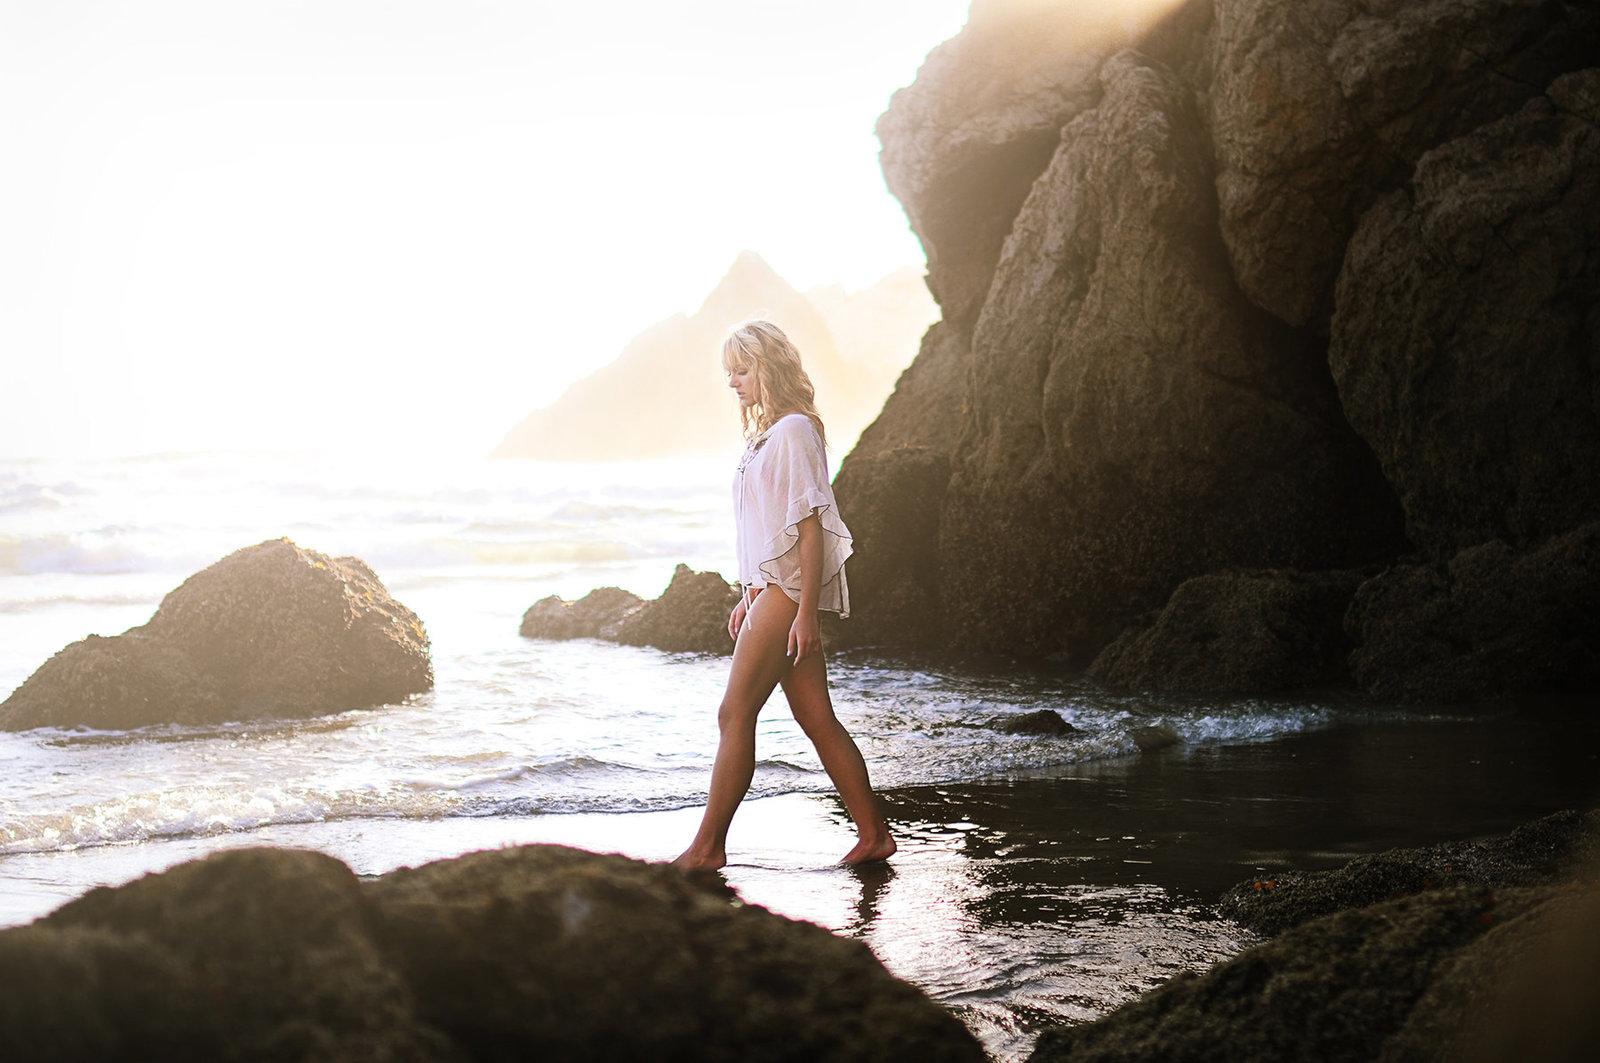 san francisco california senior photos destination portrait photographer bryan newfield photography 54